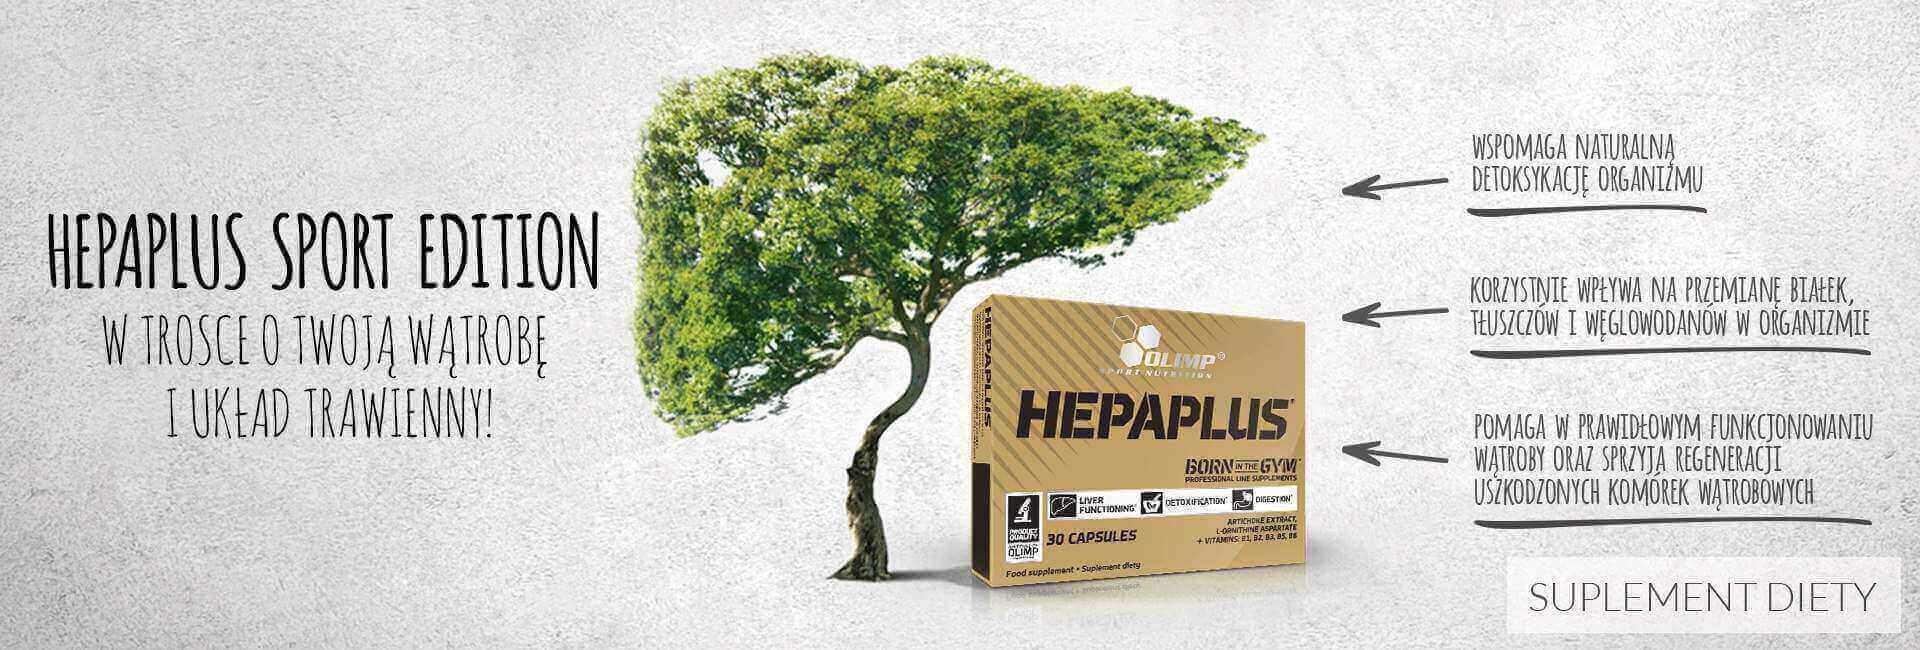 Hepaplus Sport Edition